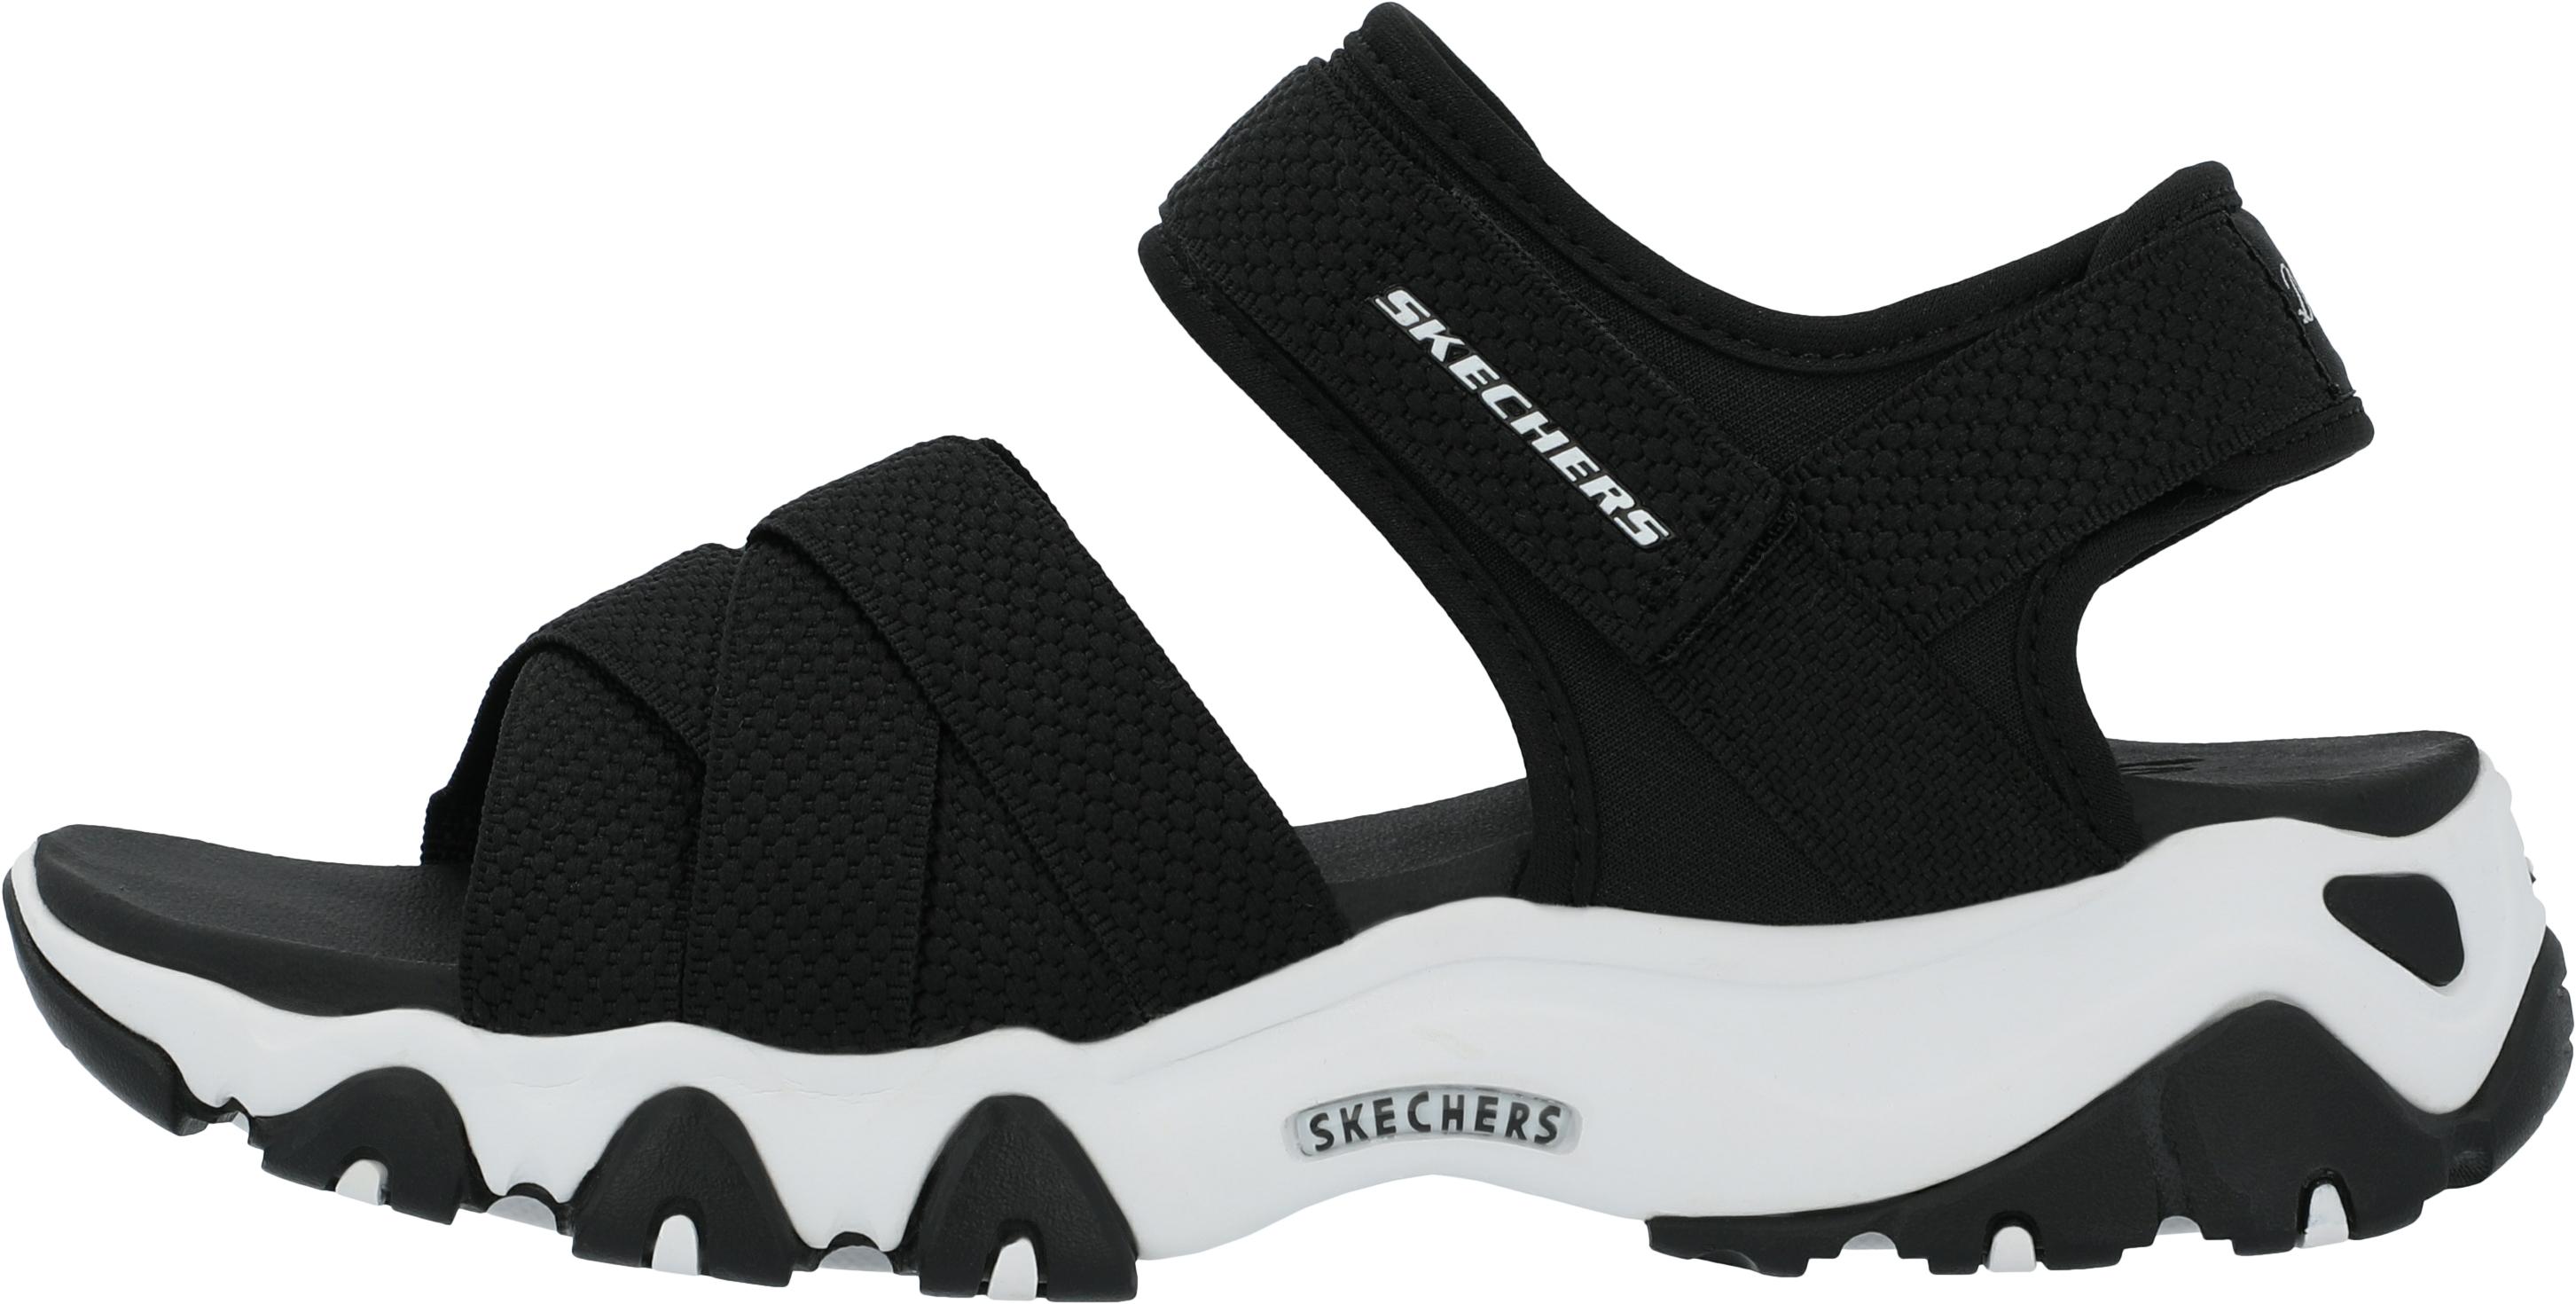 Сандалии женские Skechers D'Lites 2.0 Mega Summer, размер 37.5